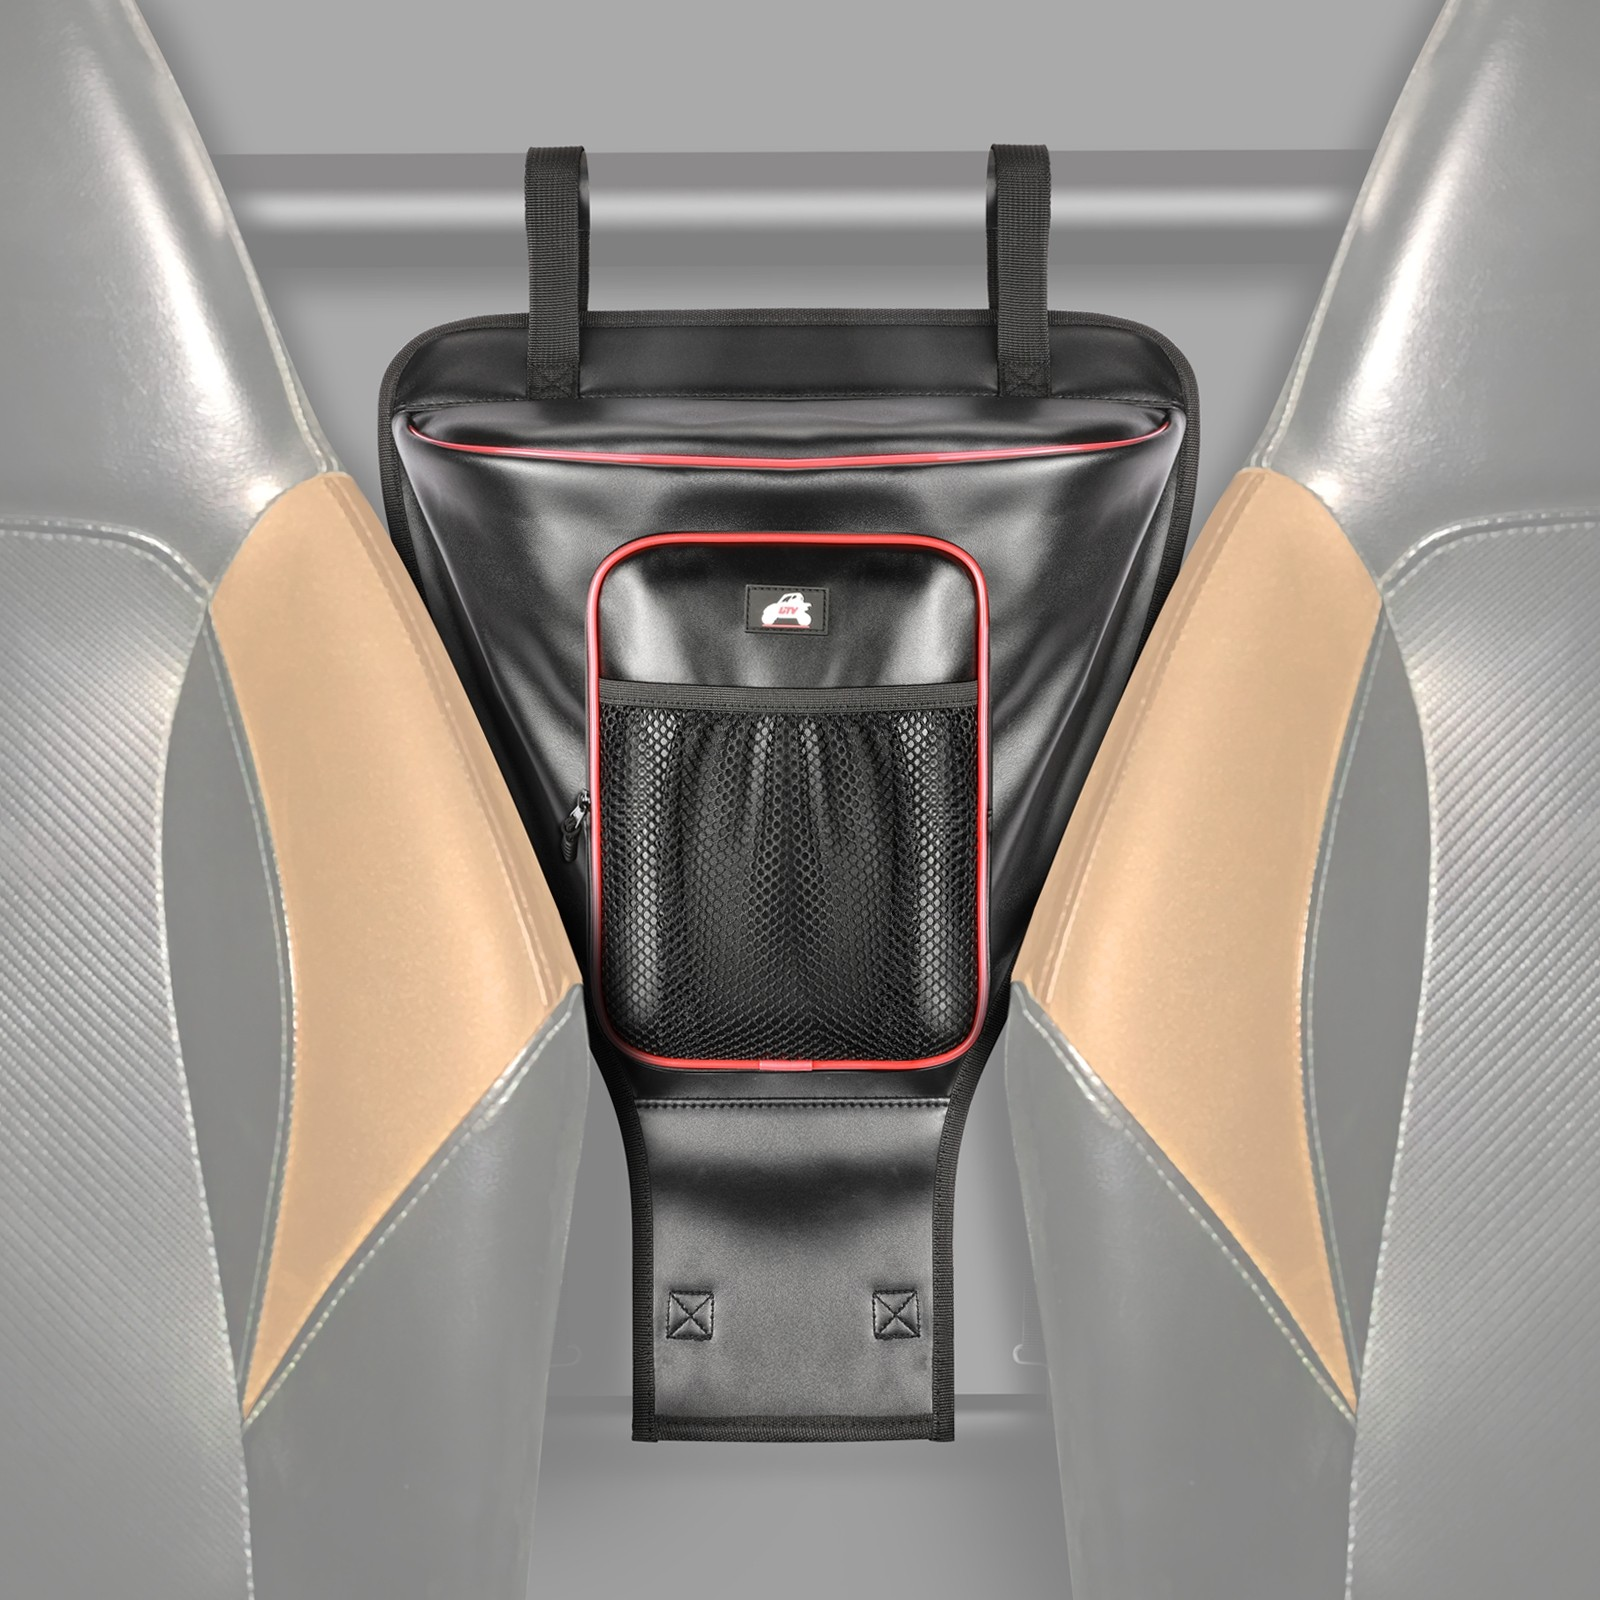 RZR Storage Bag, OFFROADTOWN UTV Cab Pack Center Seat Bag Compatible with Polaris RZR 570 S 900 1000 XP Turbo